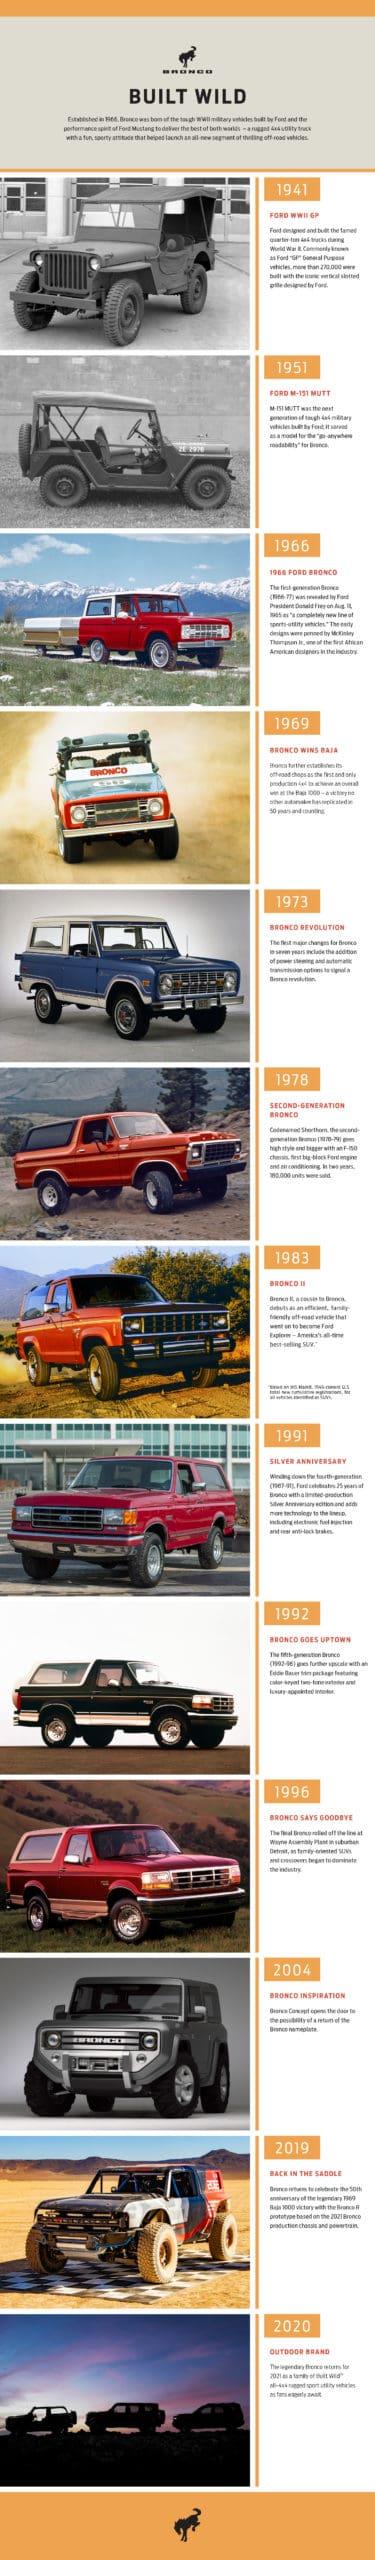 ford bronco vehicle timeline